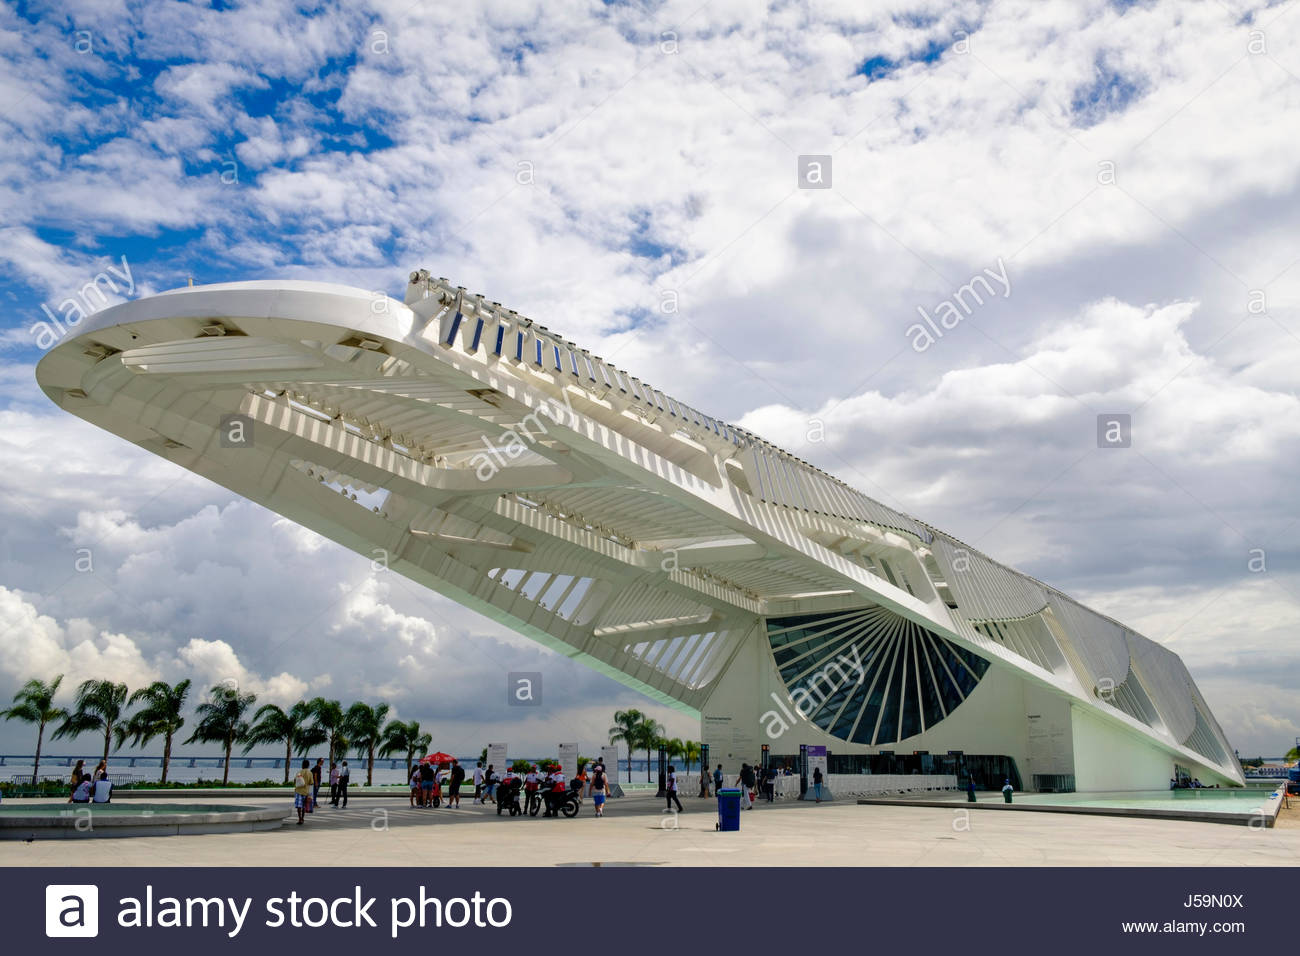 Santiago Calatrava's Museum of Tomorrow in Rio de Janeiro, Brazil - Stock Image